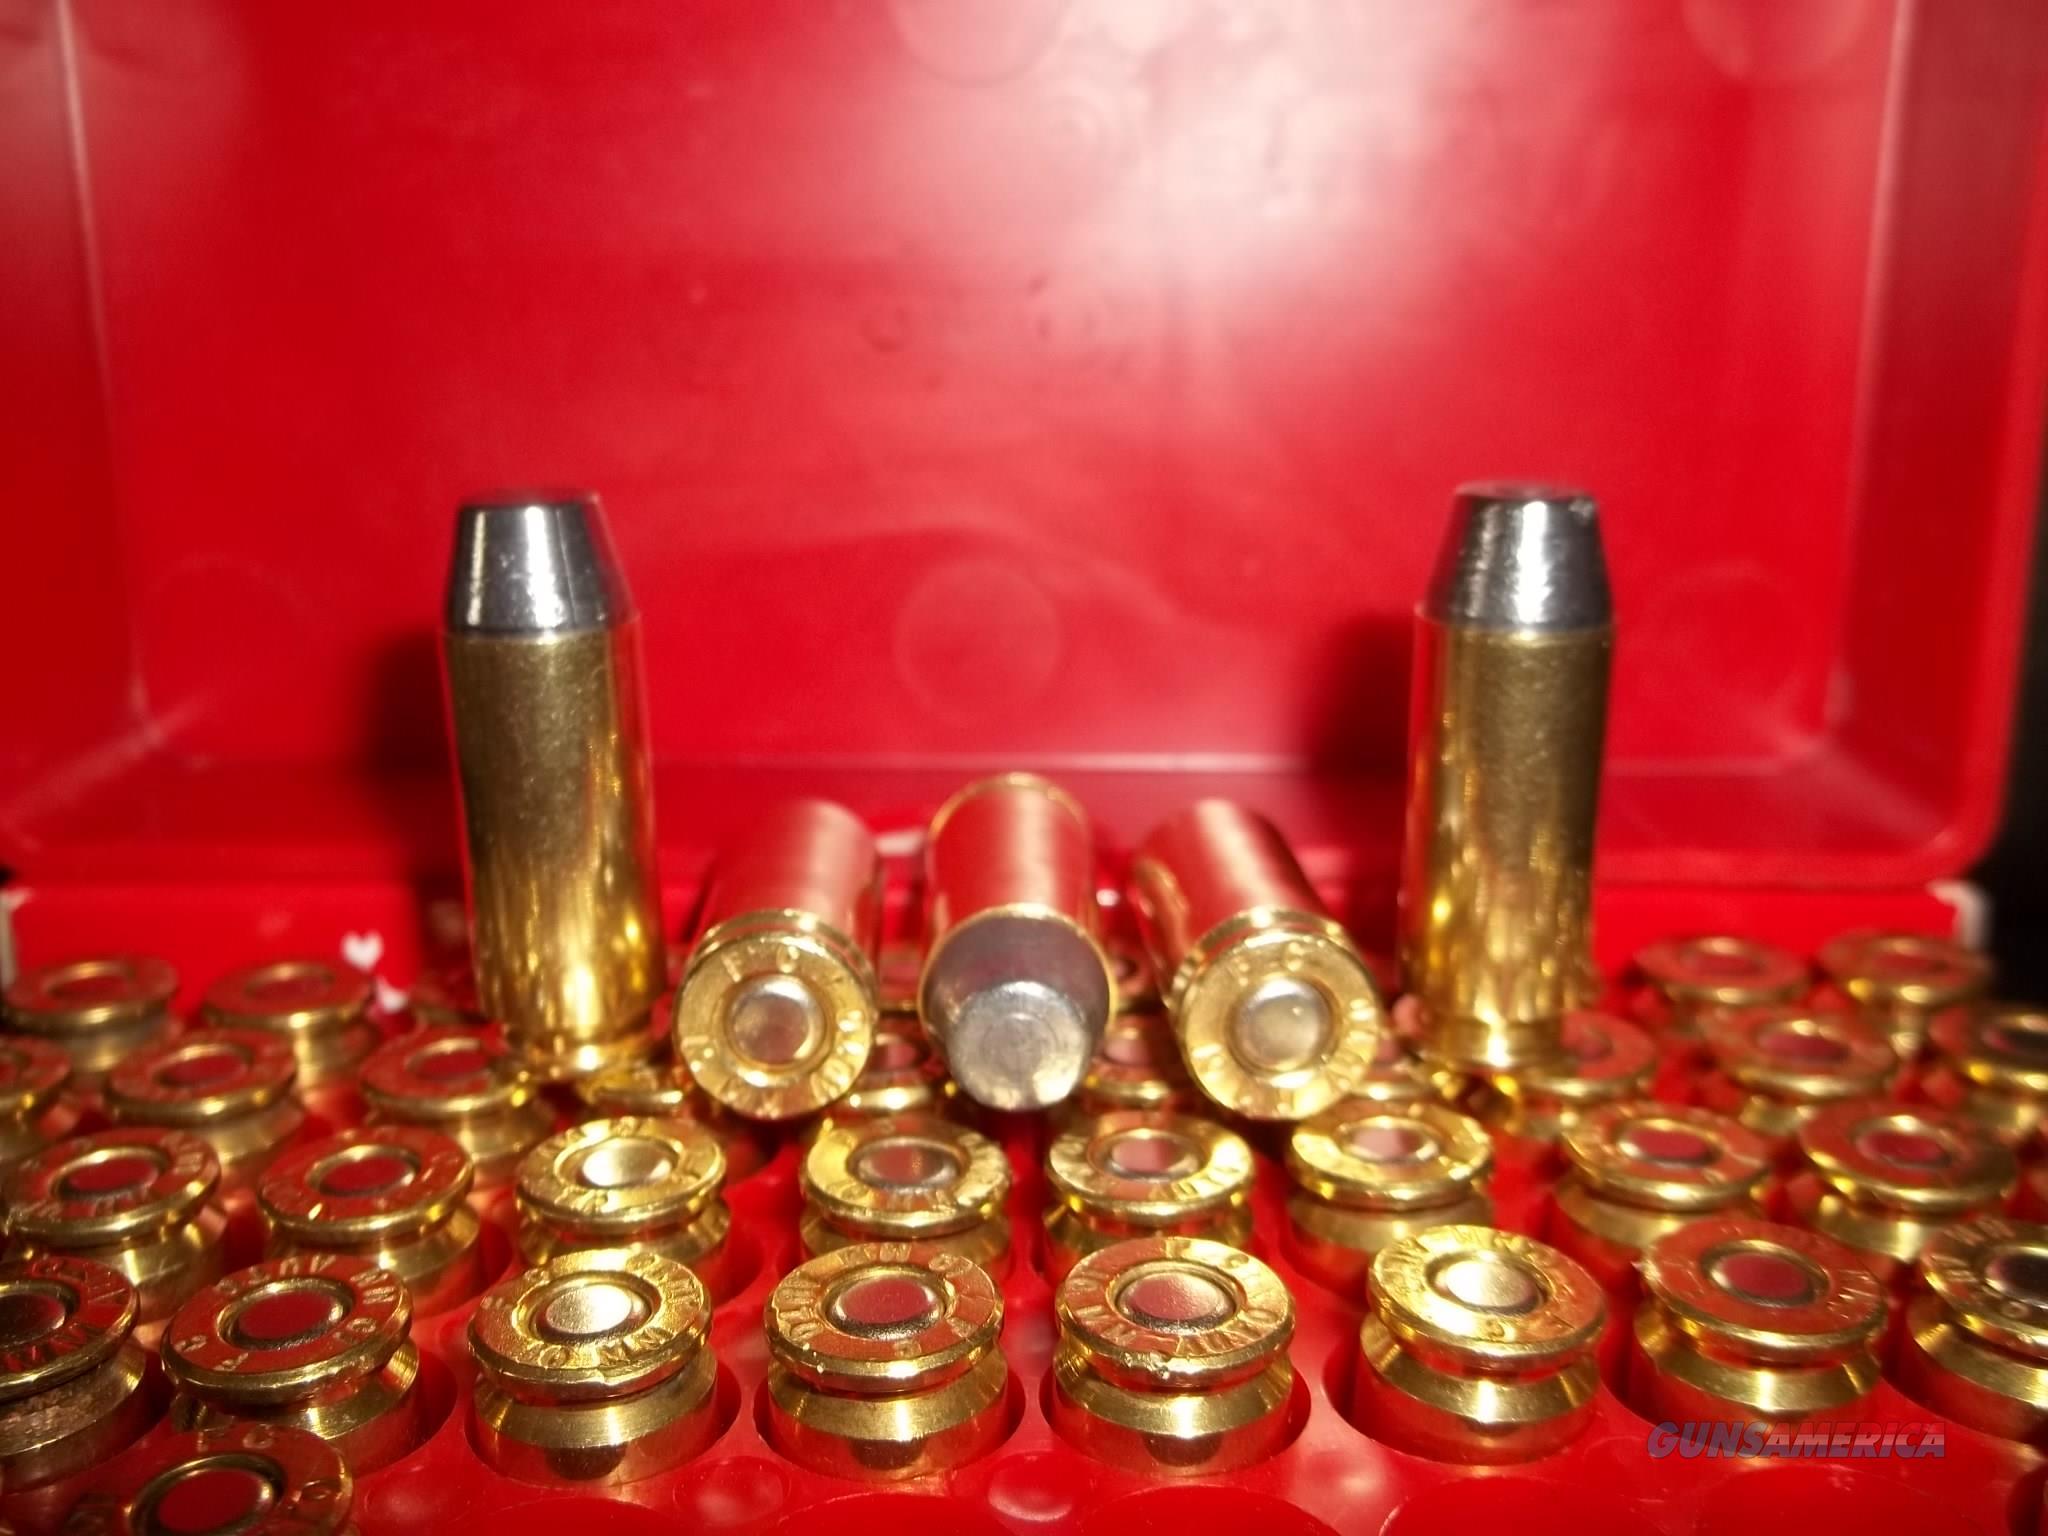 10mm Auto Ammo.  Non-Guns > Ammunition